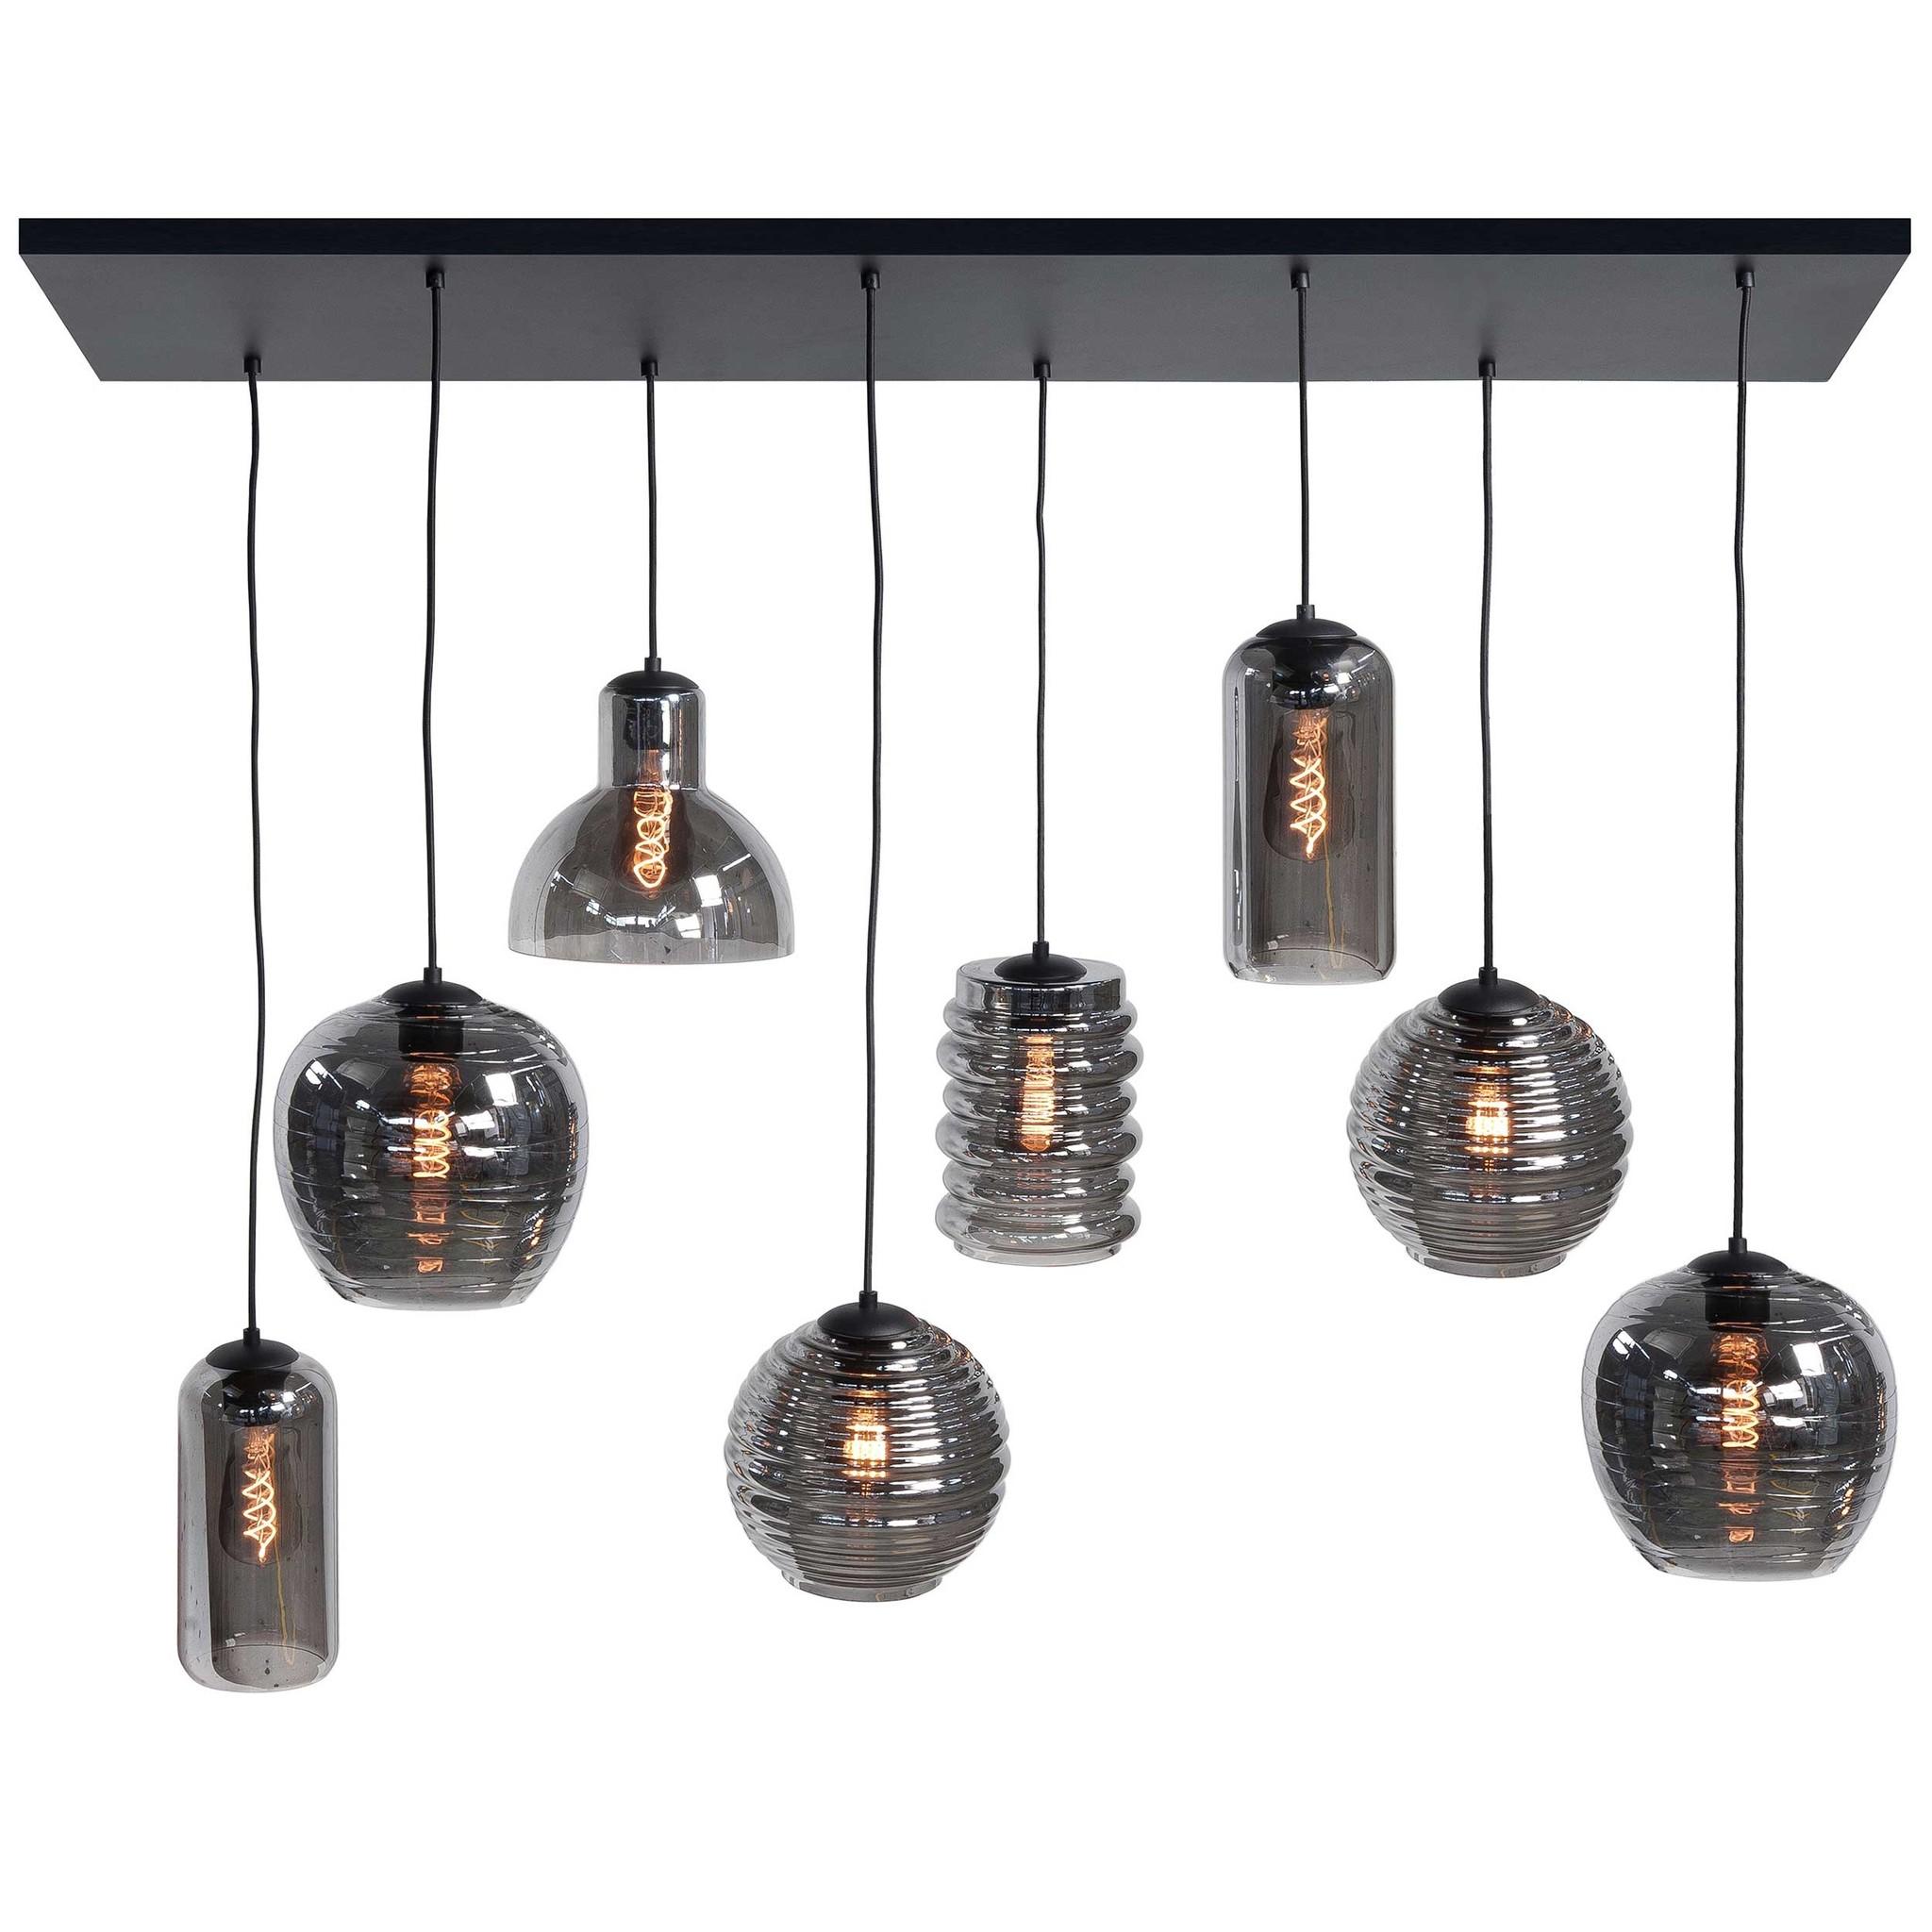 Highlight Hanglamp Fantasy 8 lichts L 130 x B 35 cm rook glas